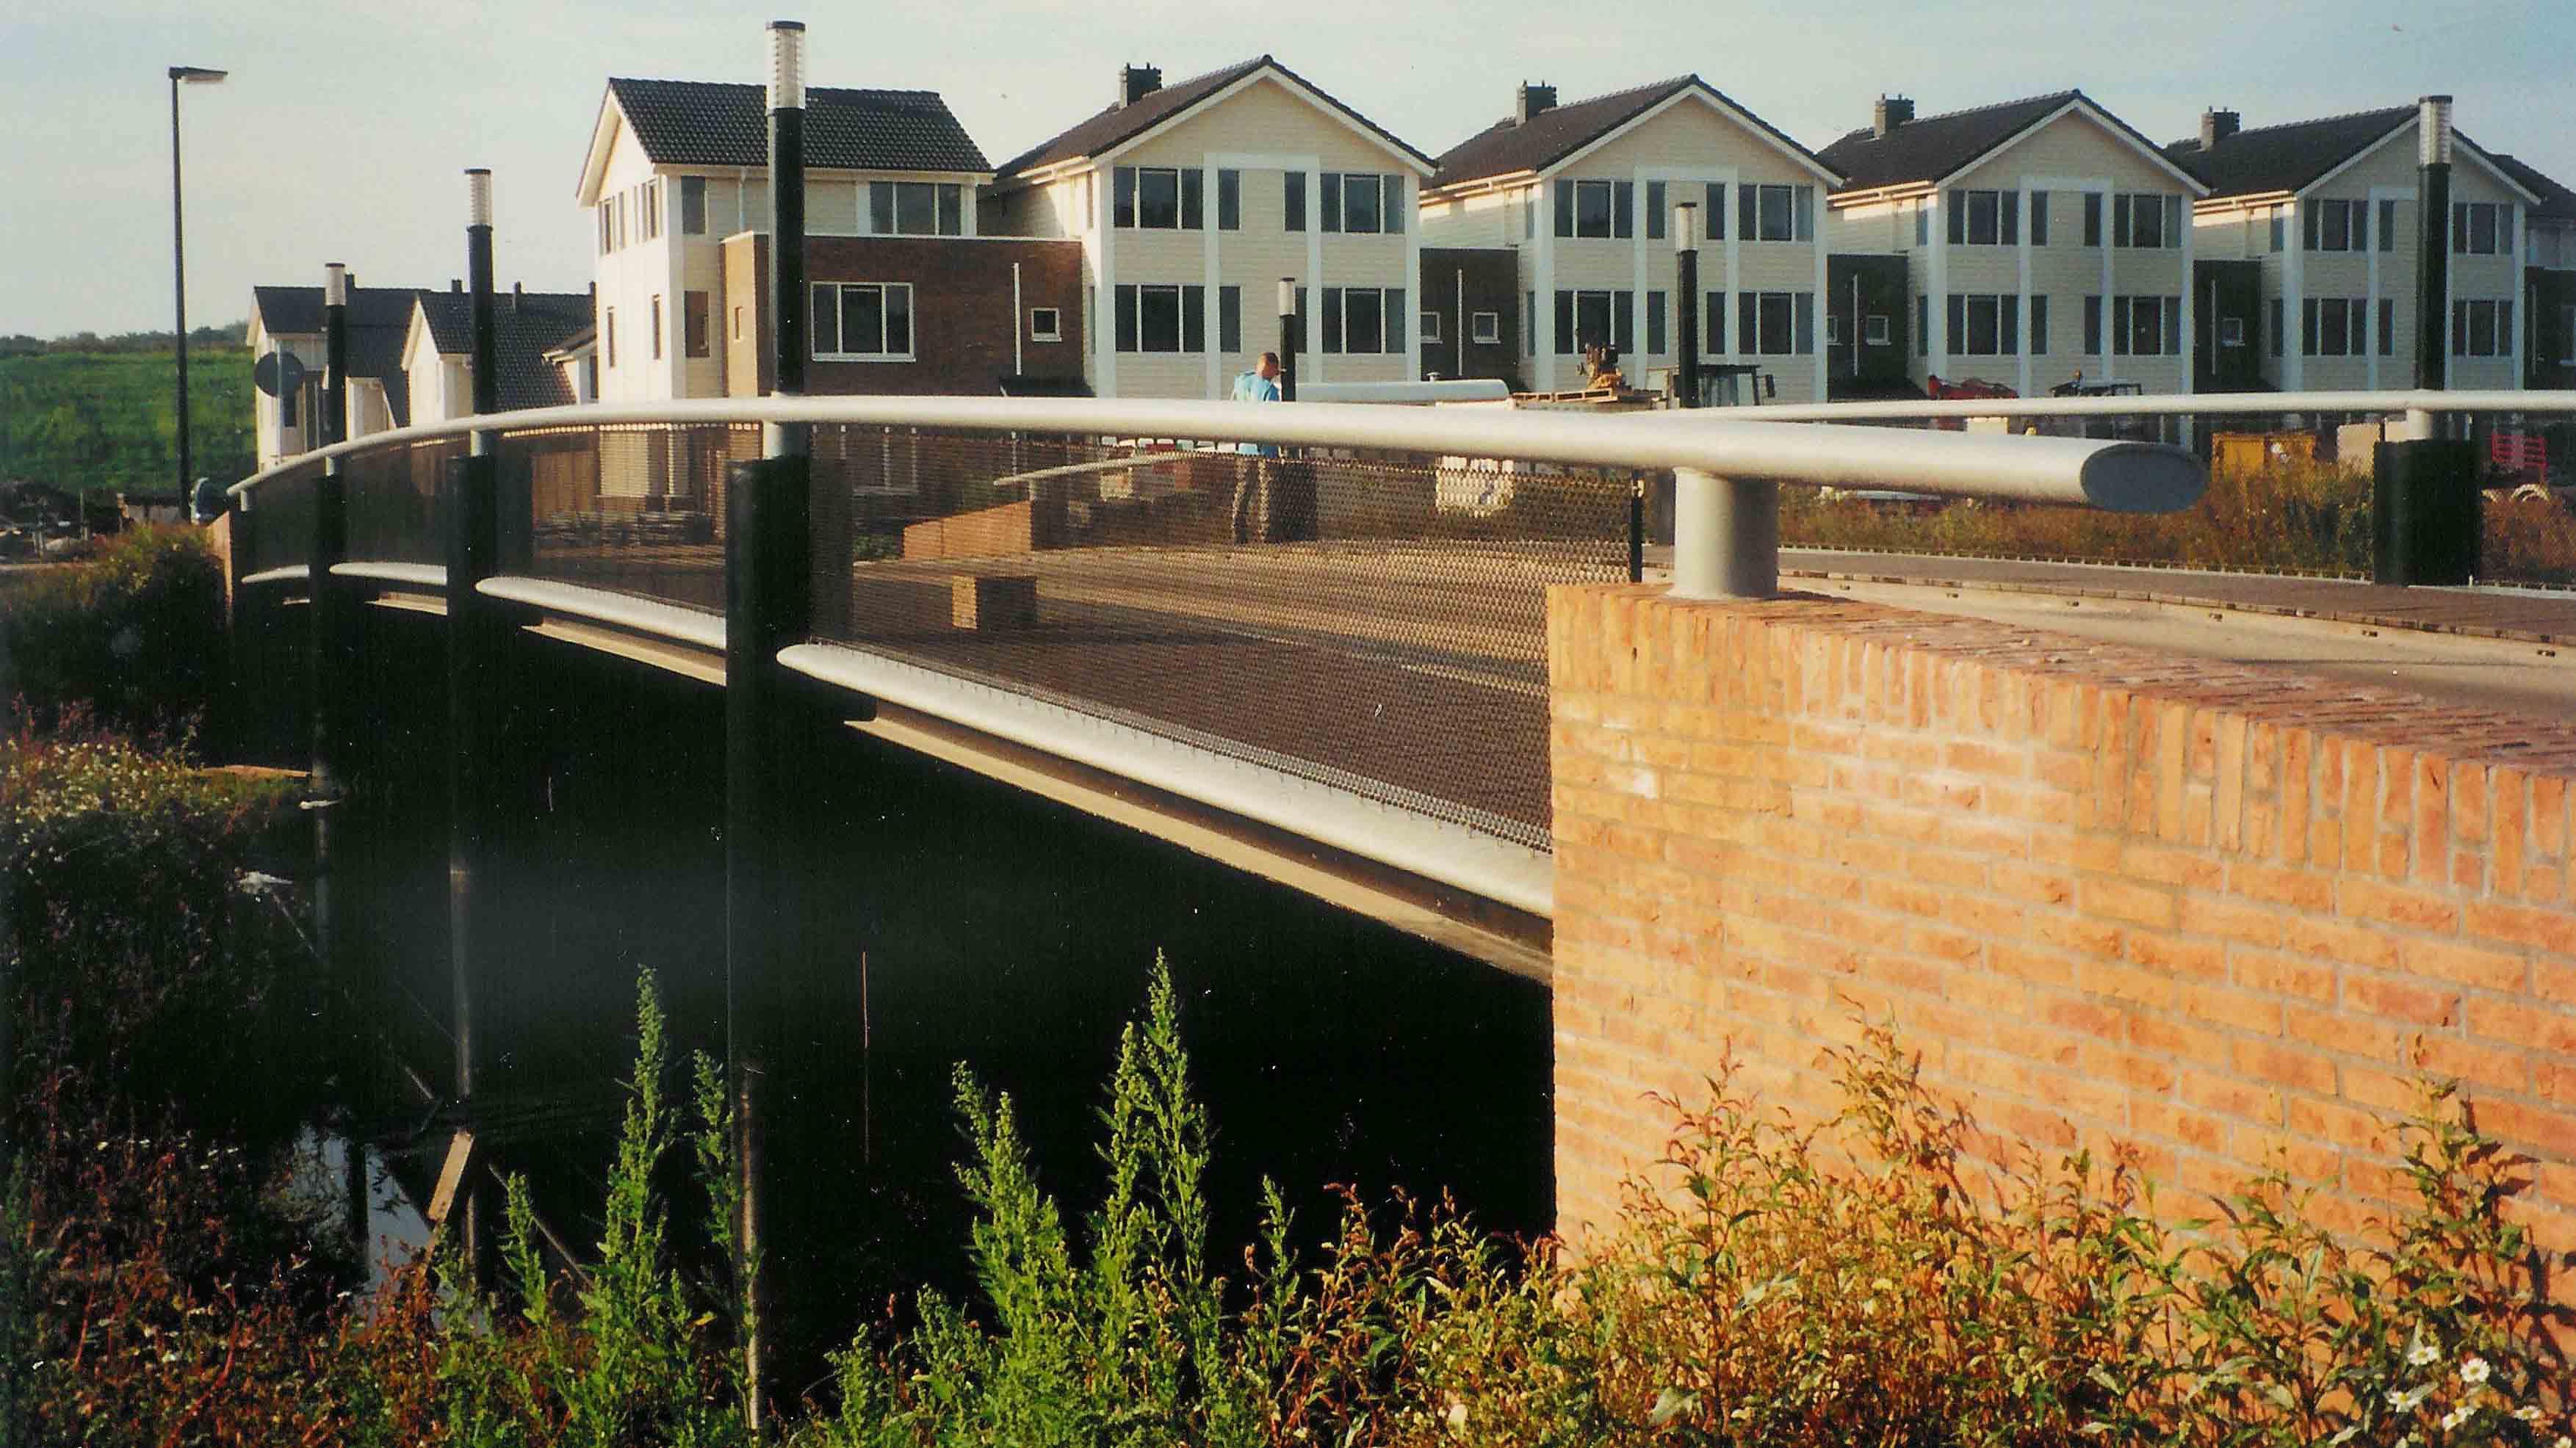 bruggen NieuwTerbregge rotterdam architect marja haring